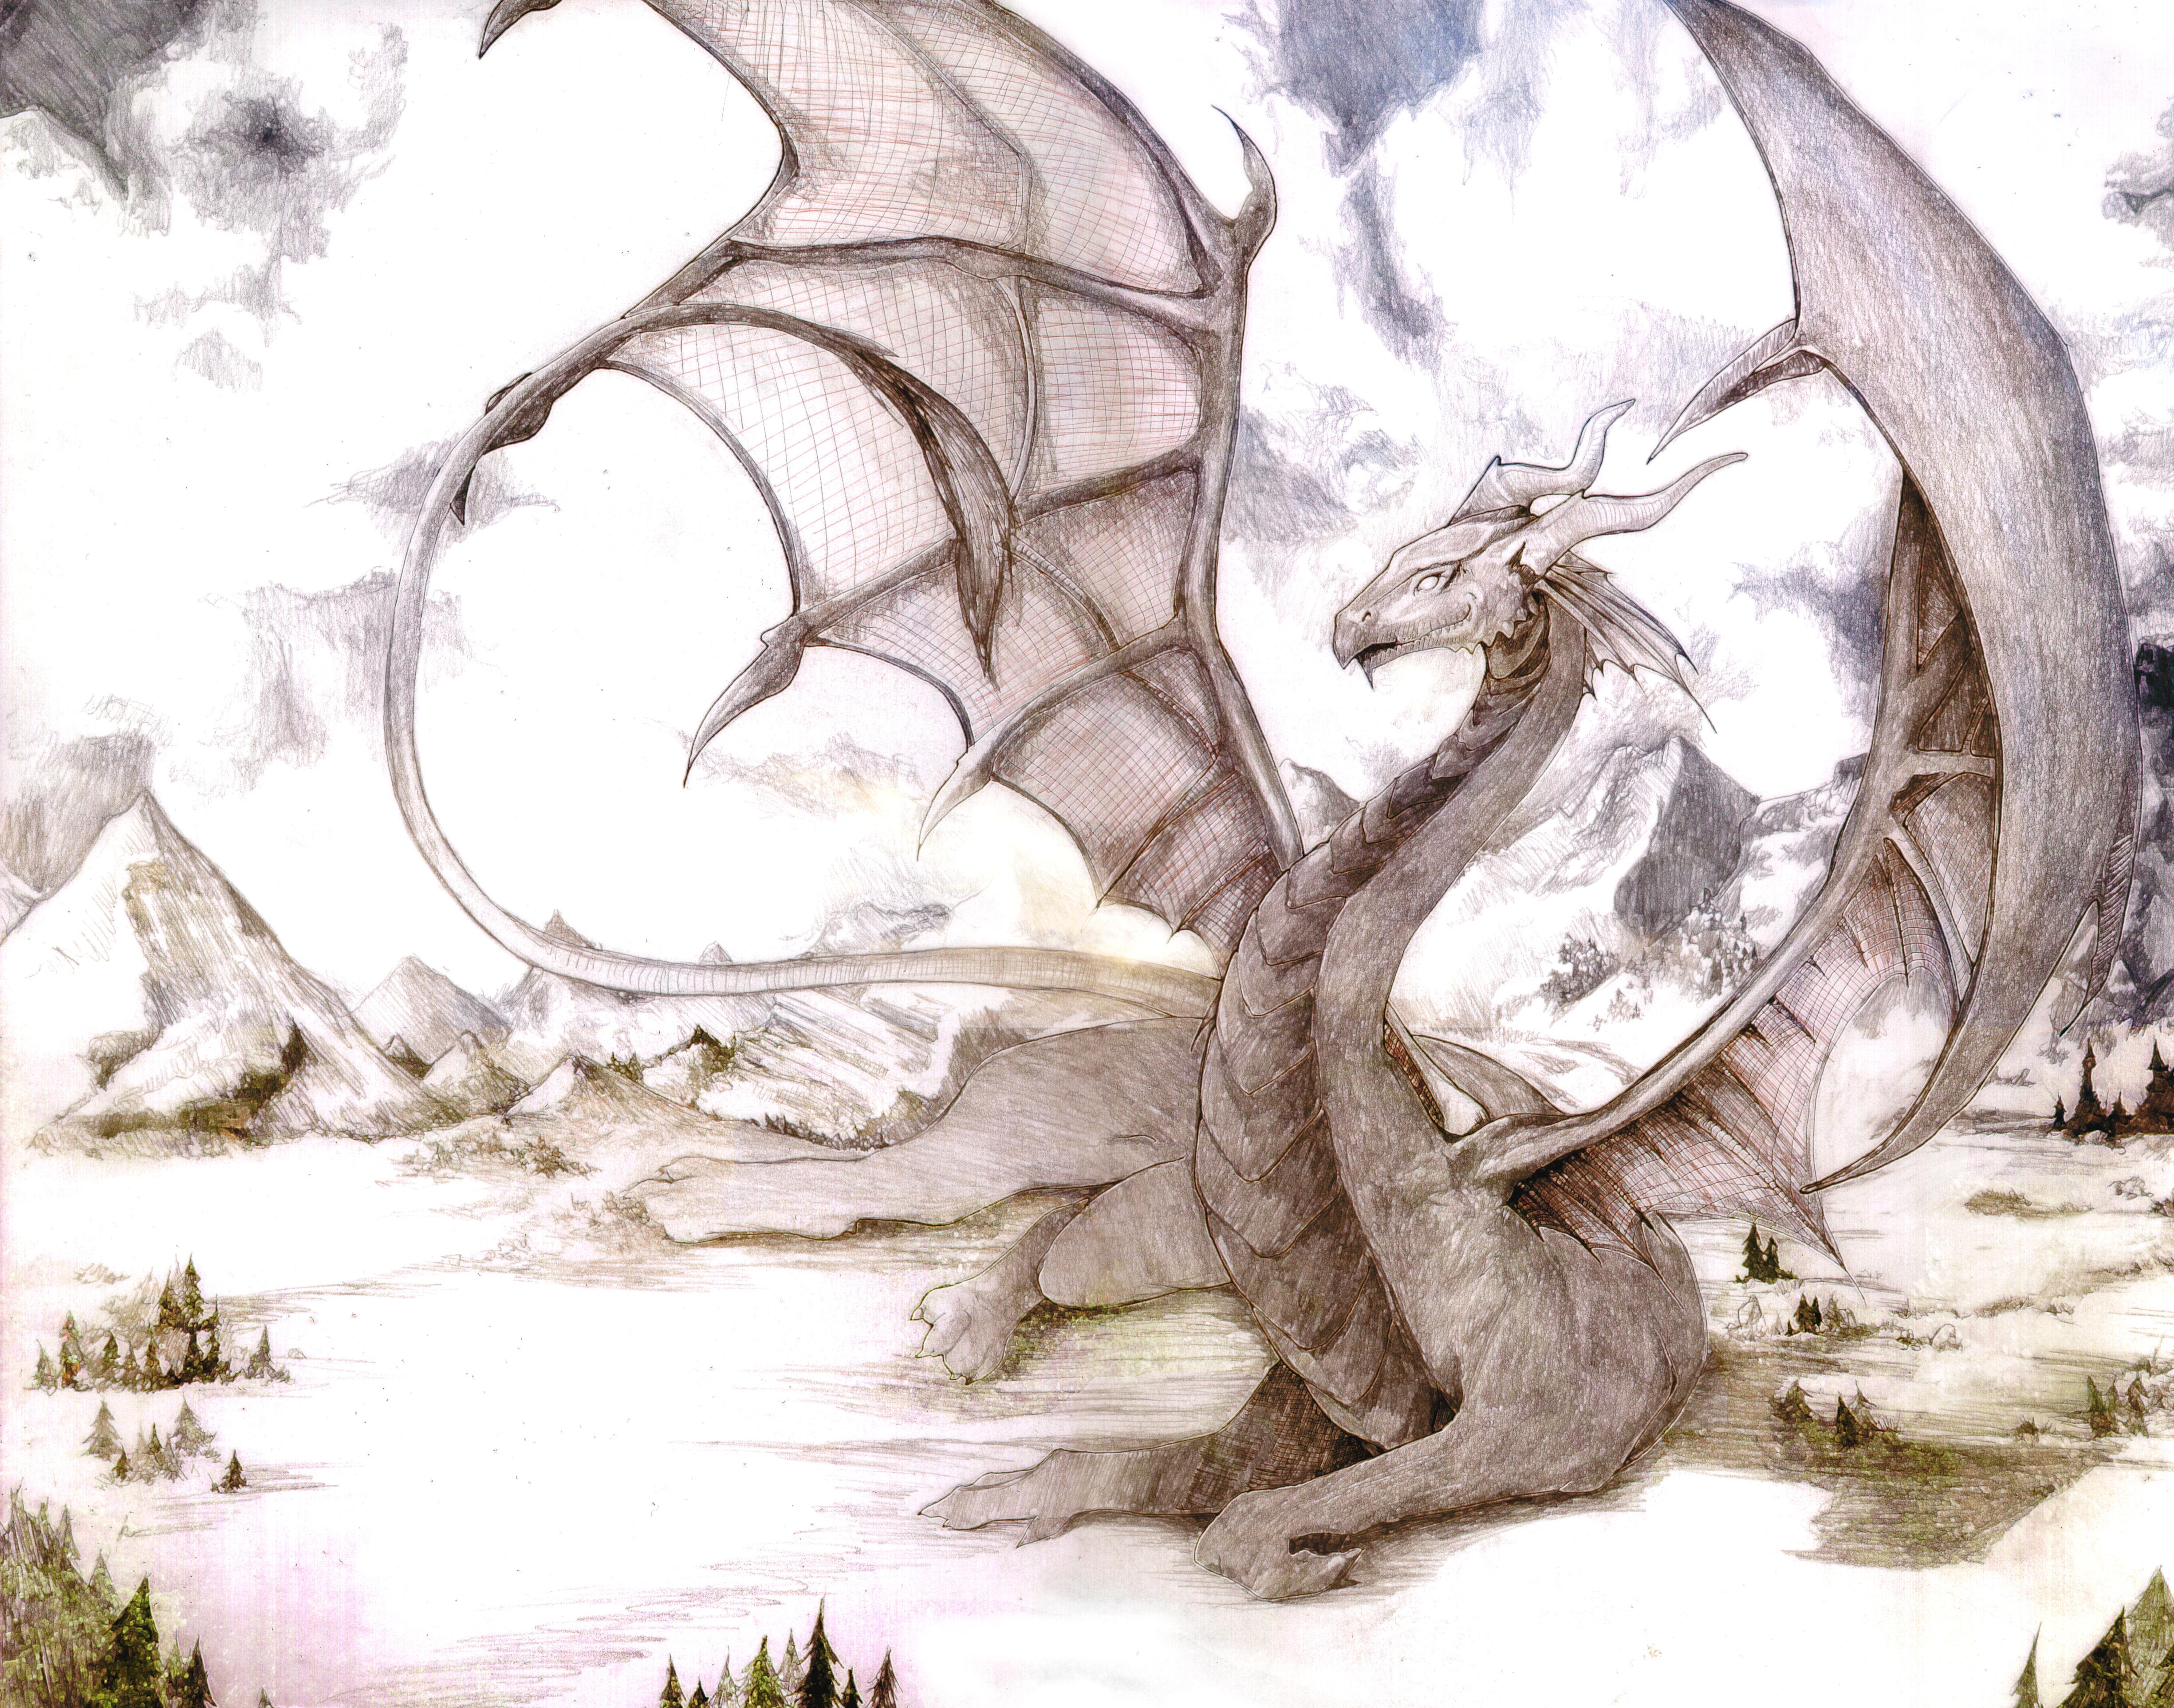 Leviathan 11x14